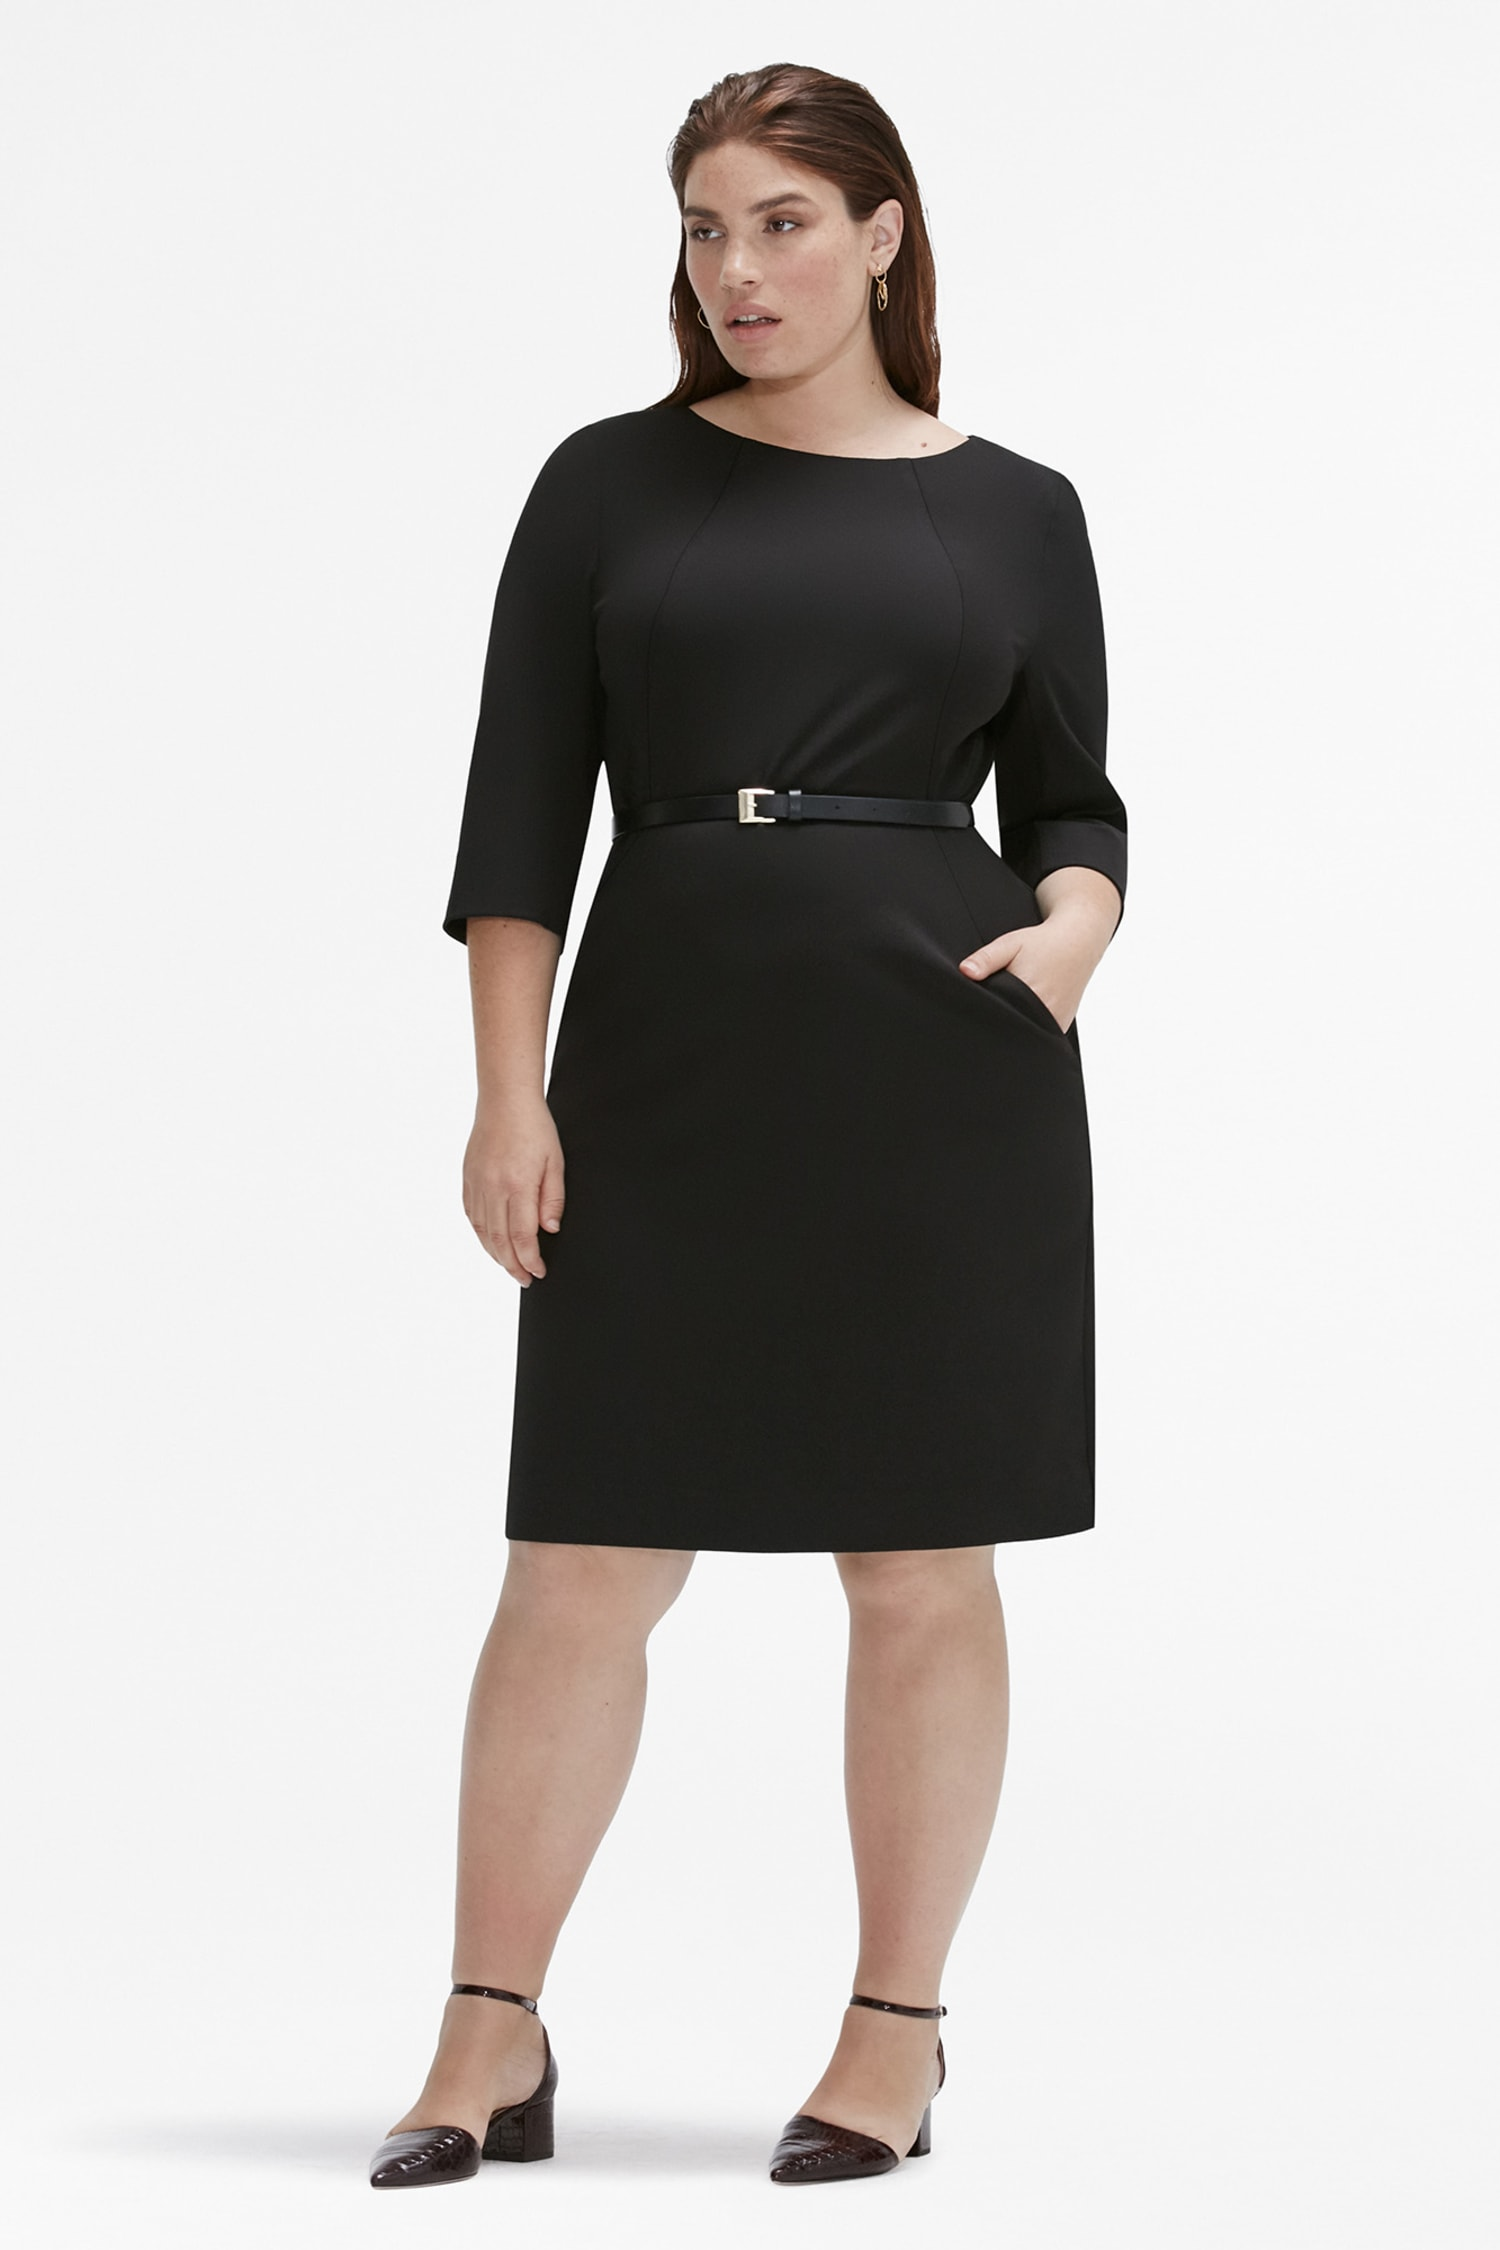 The Etsuko Dress Clarette Sandals Cristina Beige 1